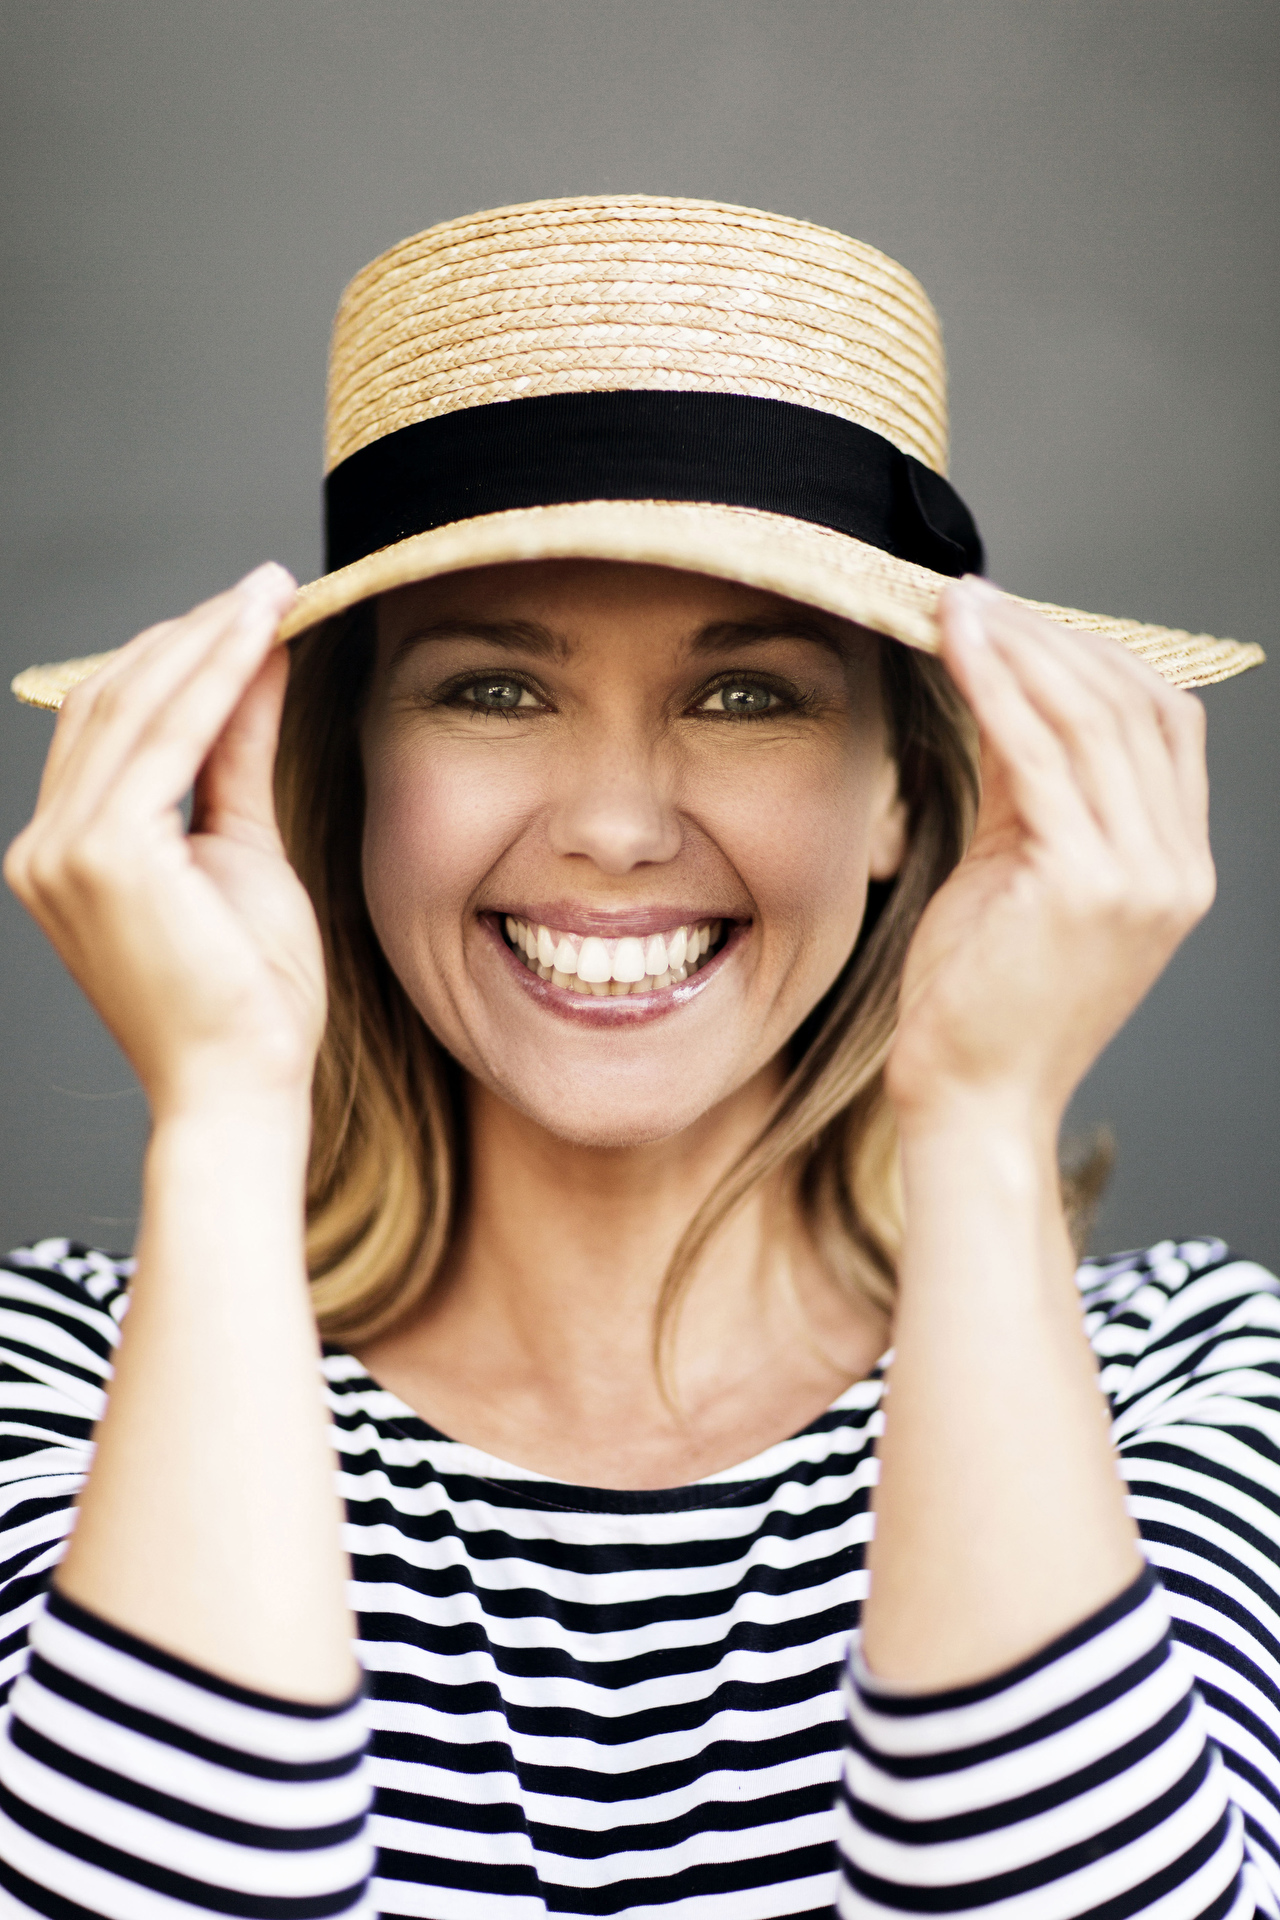 Sydney portrait photographer, personal branding, head shots, corporate photography, Edwina Bartholomew, journalist, TV presenter